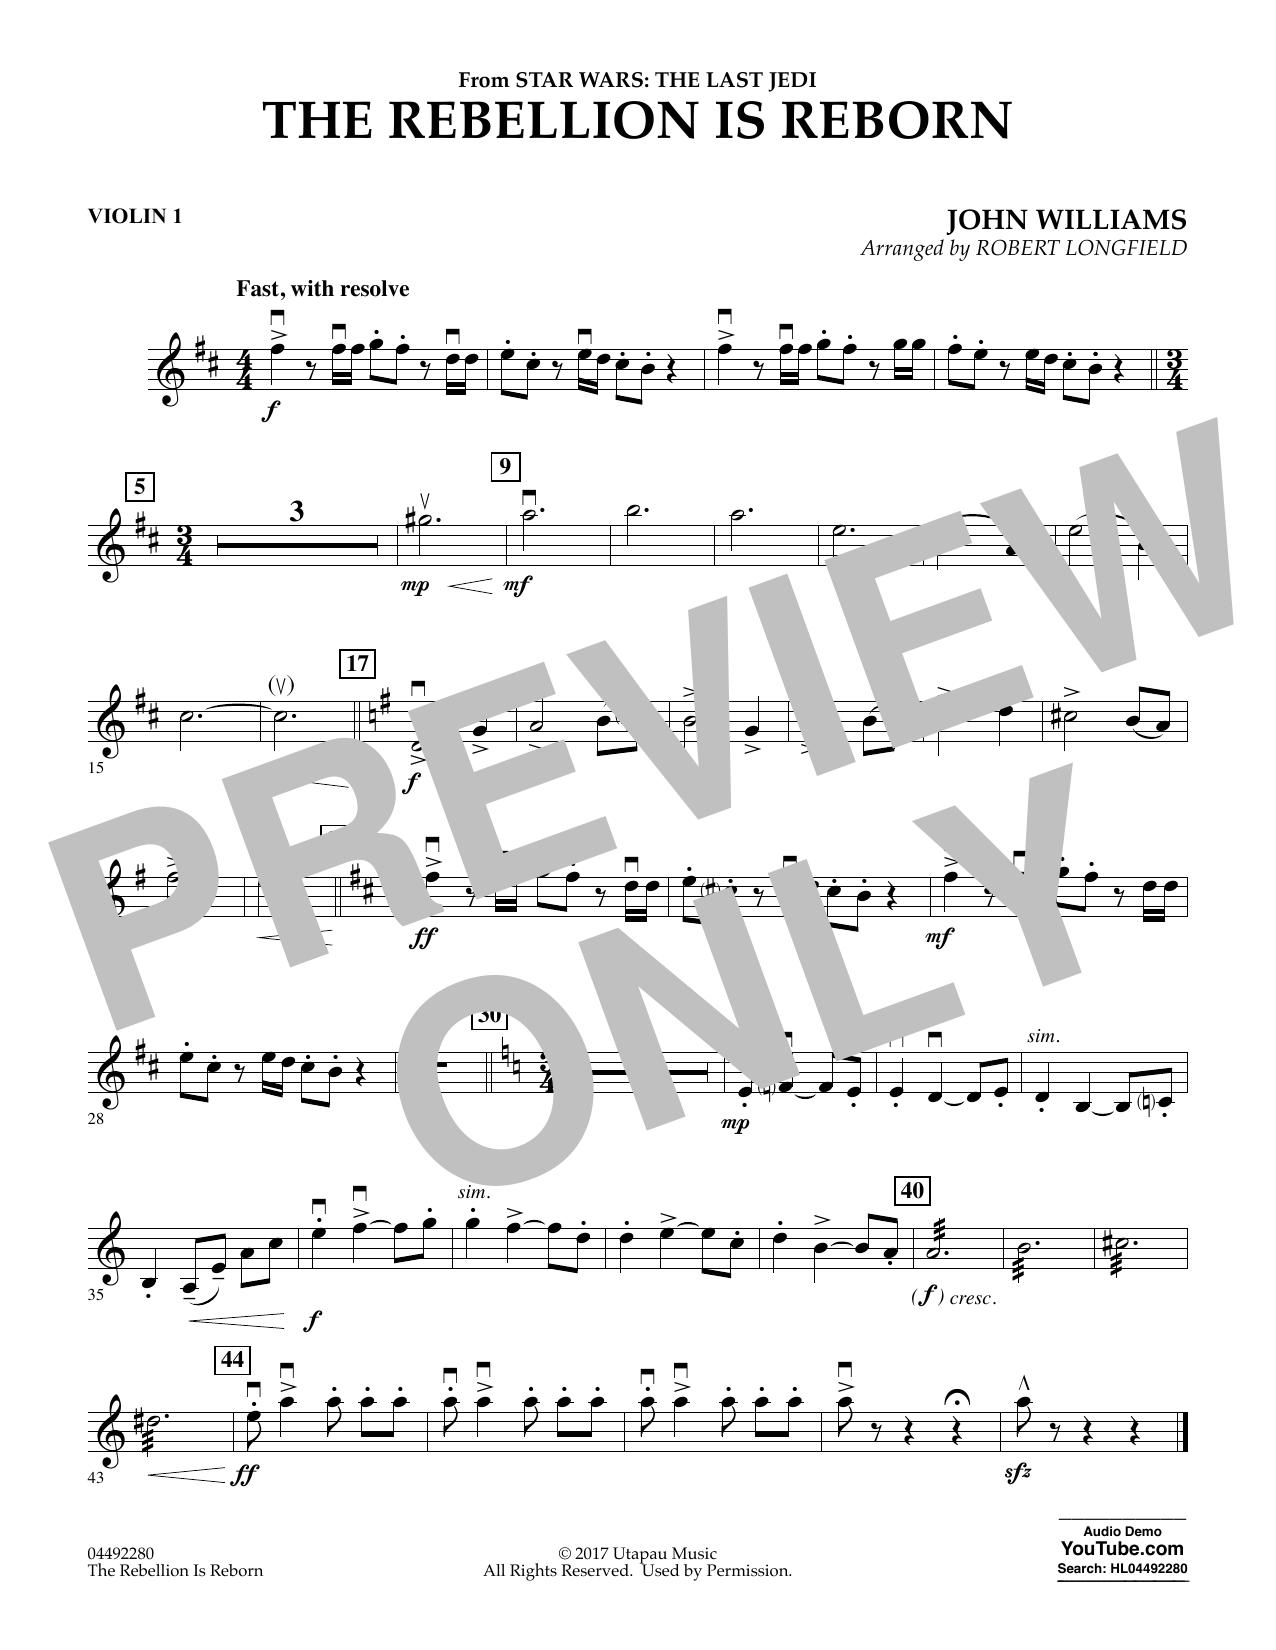 The Rebellion Is Reborn (from Star Wars: The Last Jedi) - Violin 1 (Orchestra)